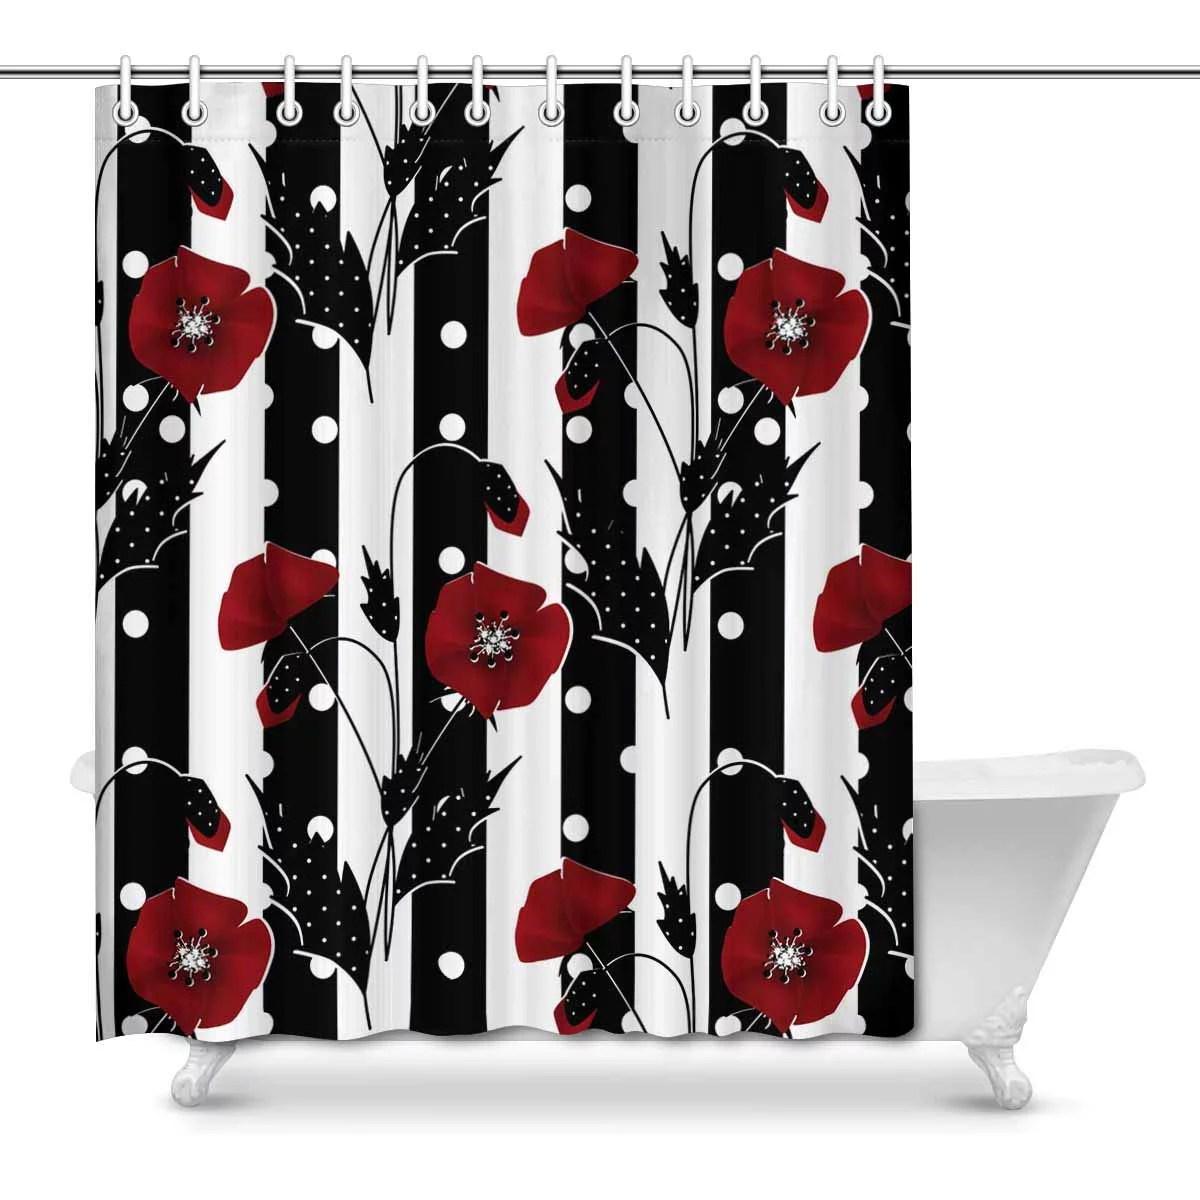 mkhert red poppies on black white stripes house decor shower curtain for bathroom decorative fabric bath curtain set 66x72 inch